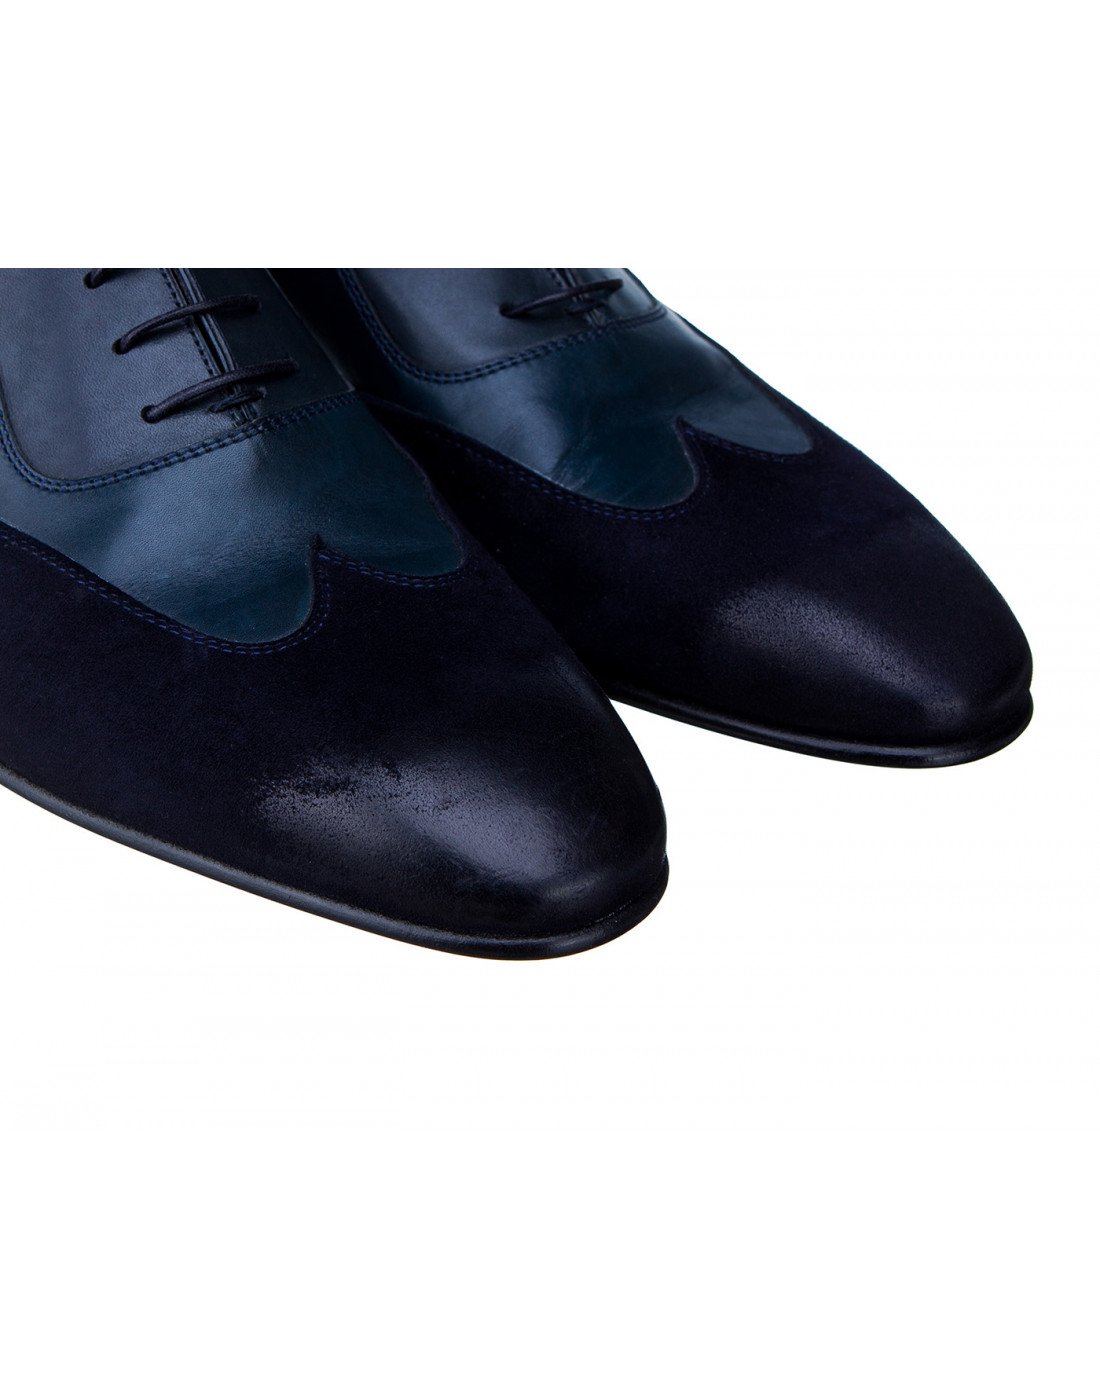 Туфли синие мужские Moreschi S42619 BLUE-4